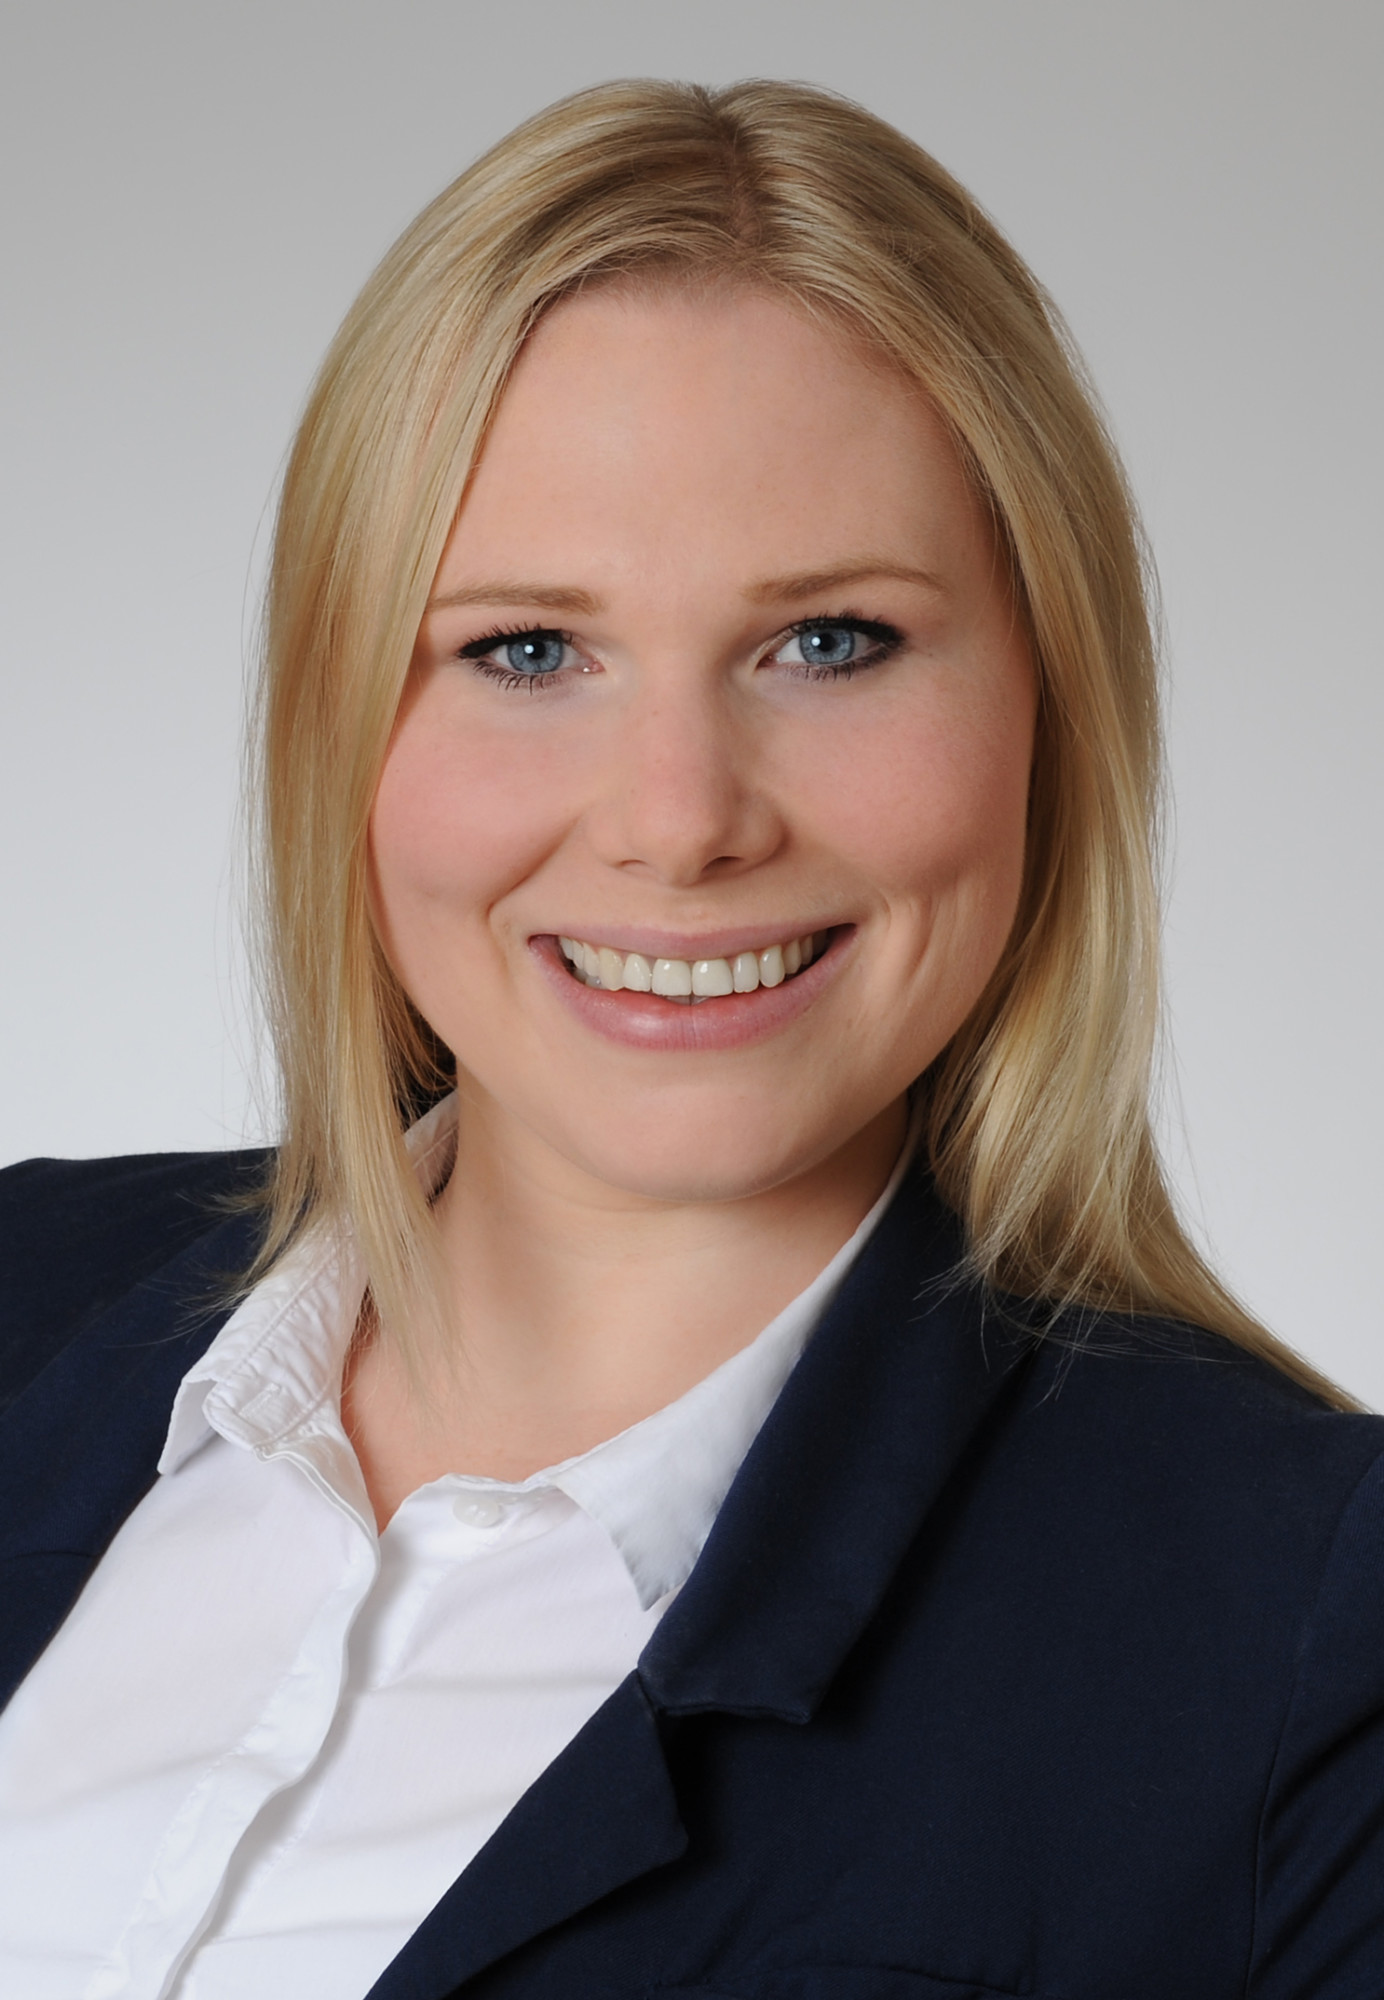 M.Sc. Melanie Lavery